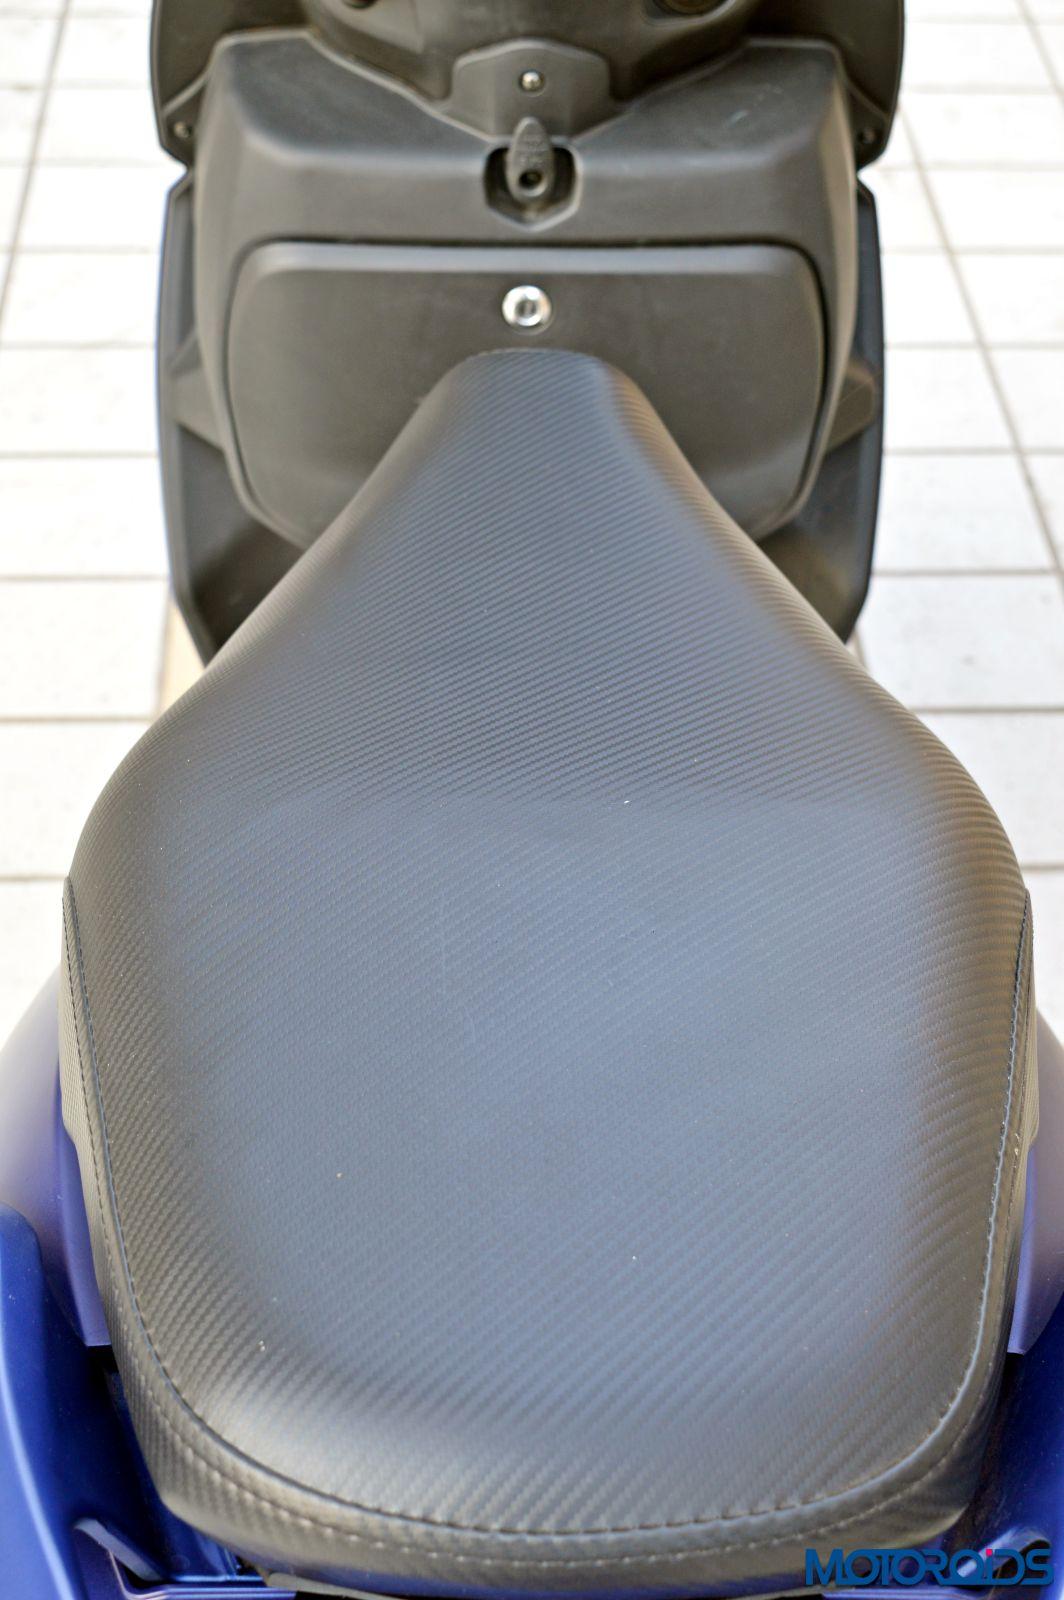 Hero Maestro Edge - Review - Details - Seat (2)